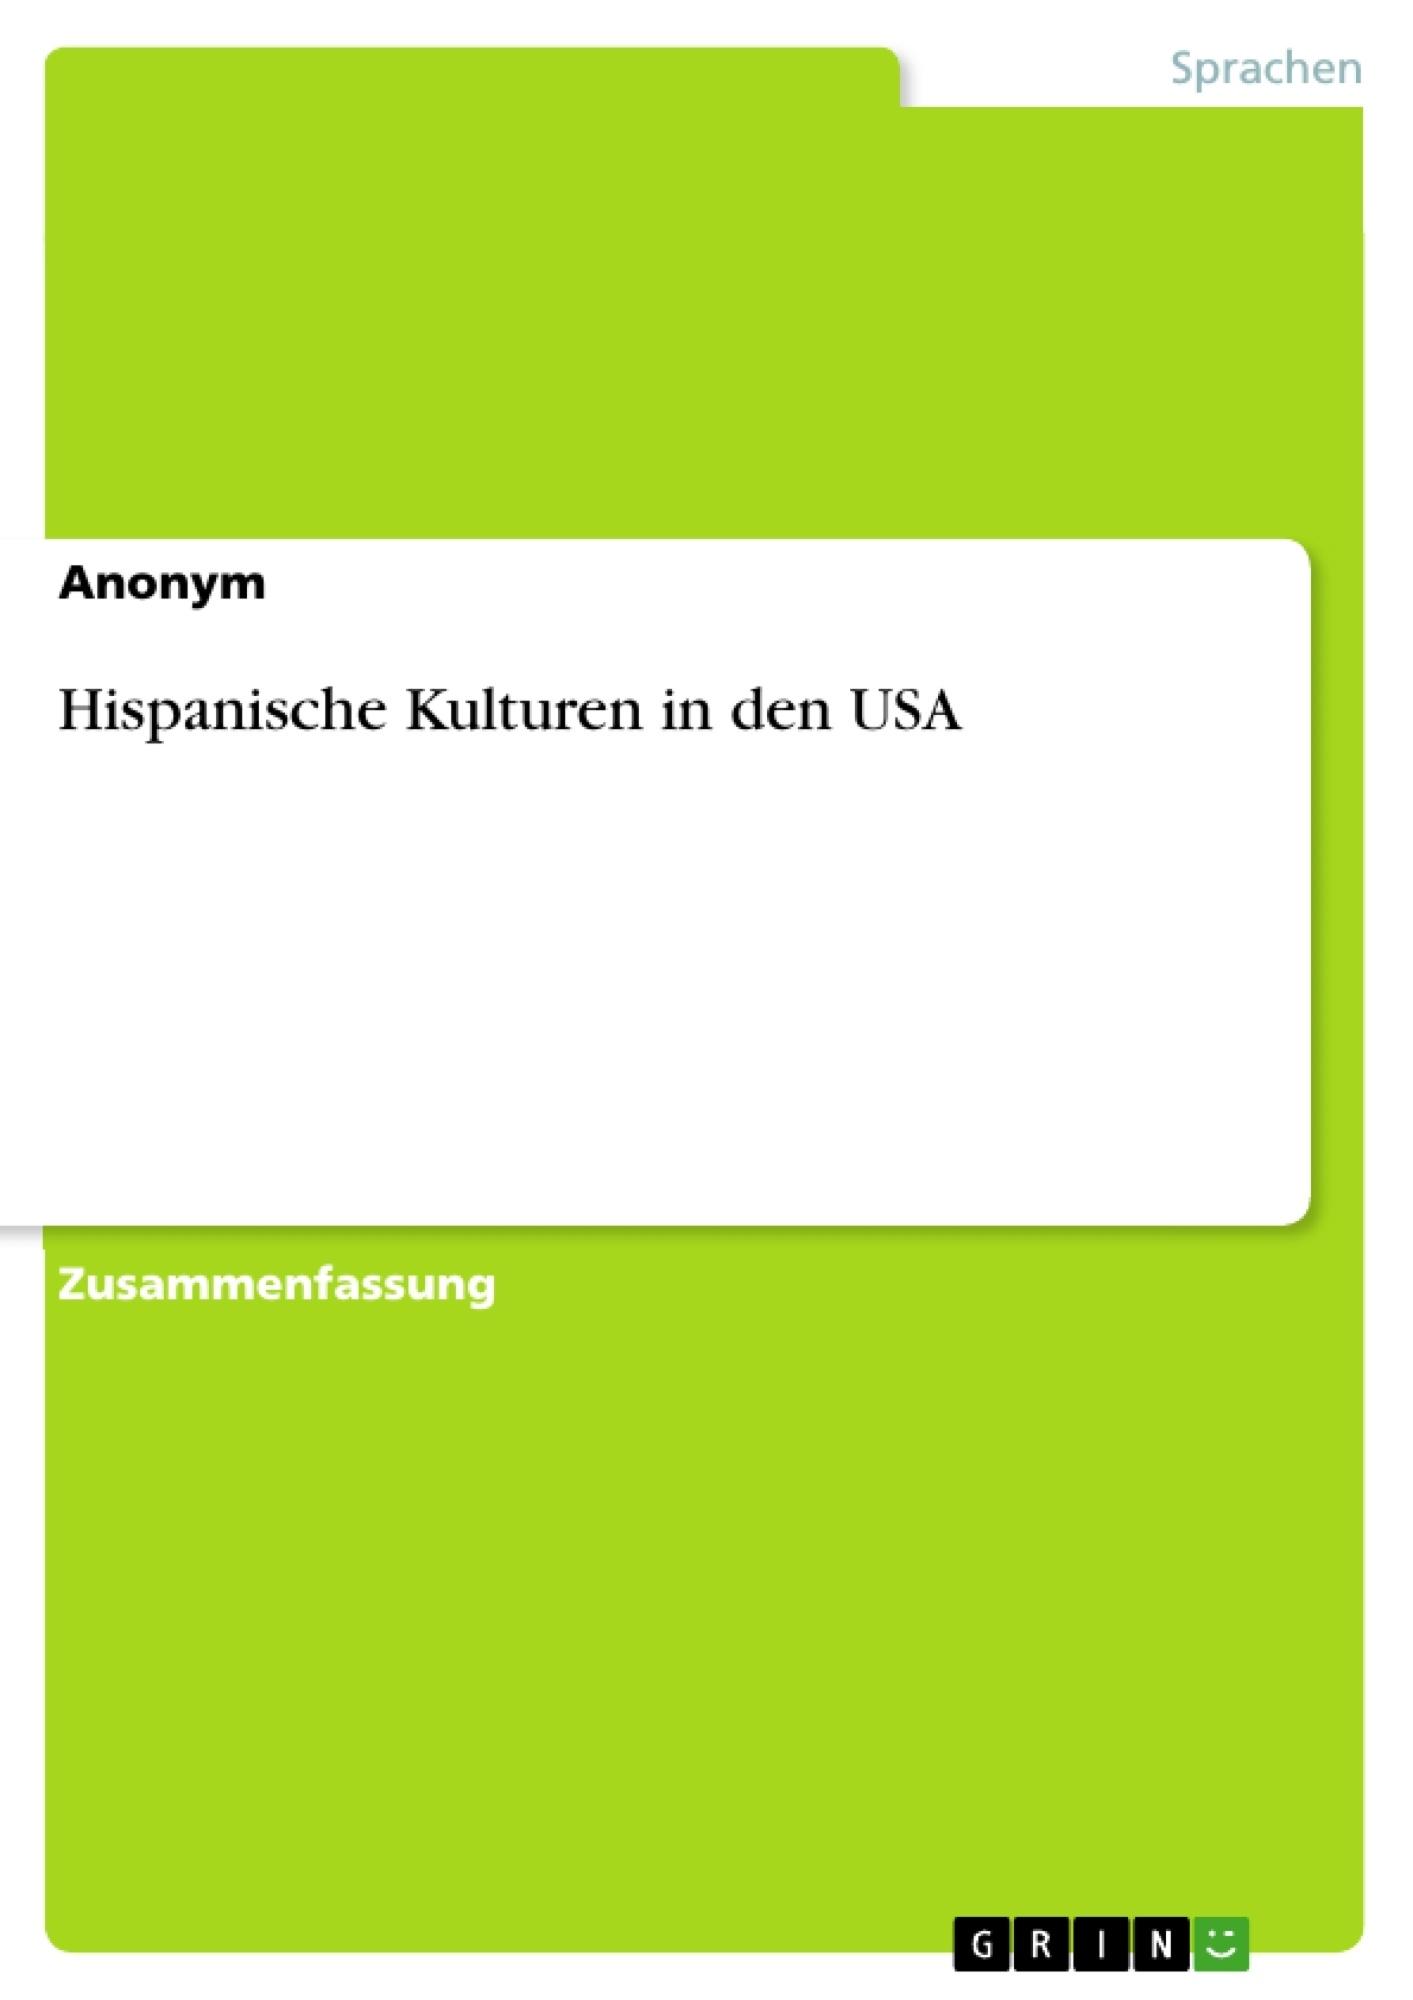 Titel: Hispanische Kulturen in den USA